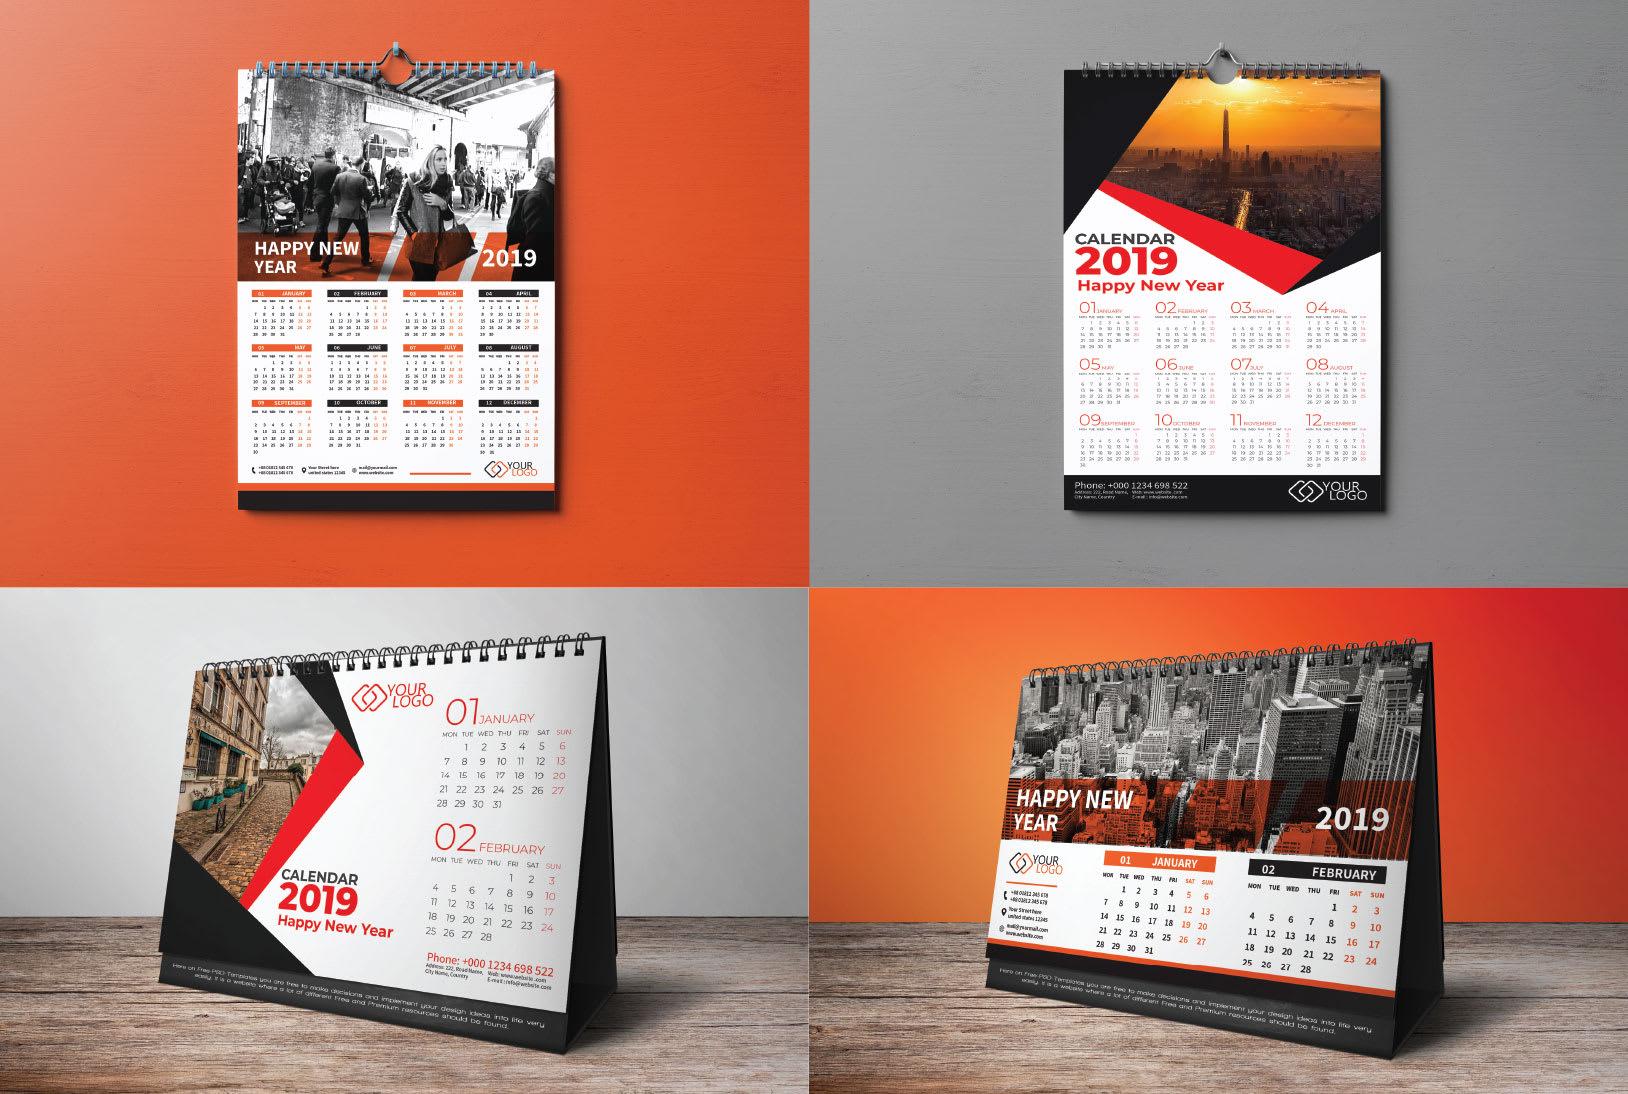 I Will Do Creative Exclusive With Unique Calendar Design